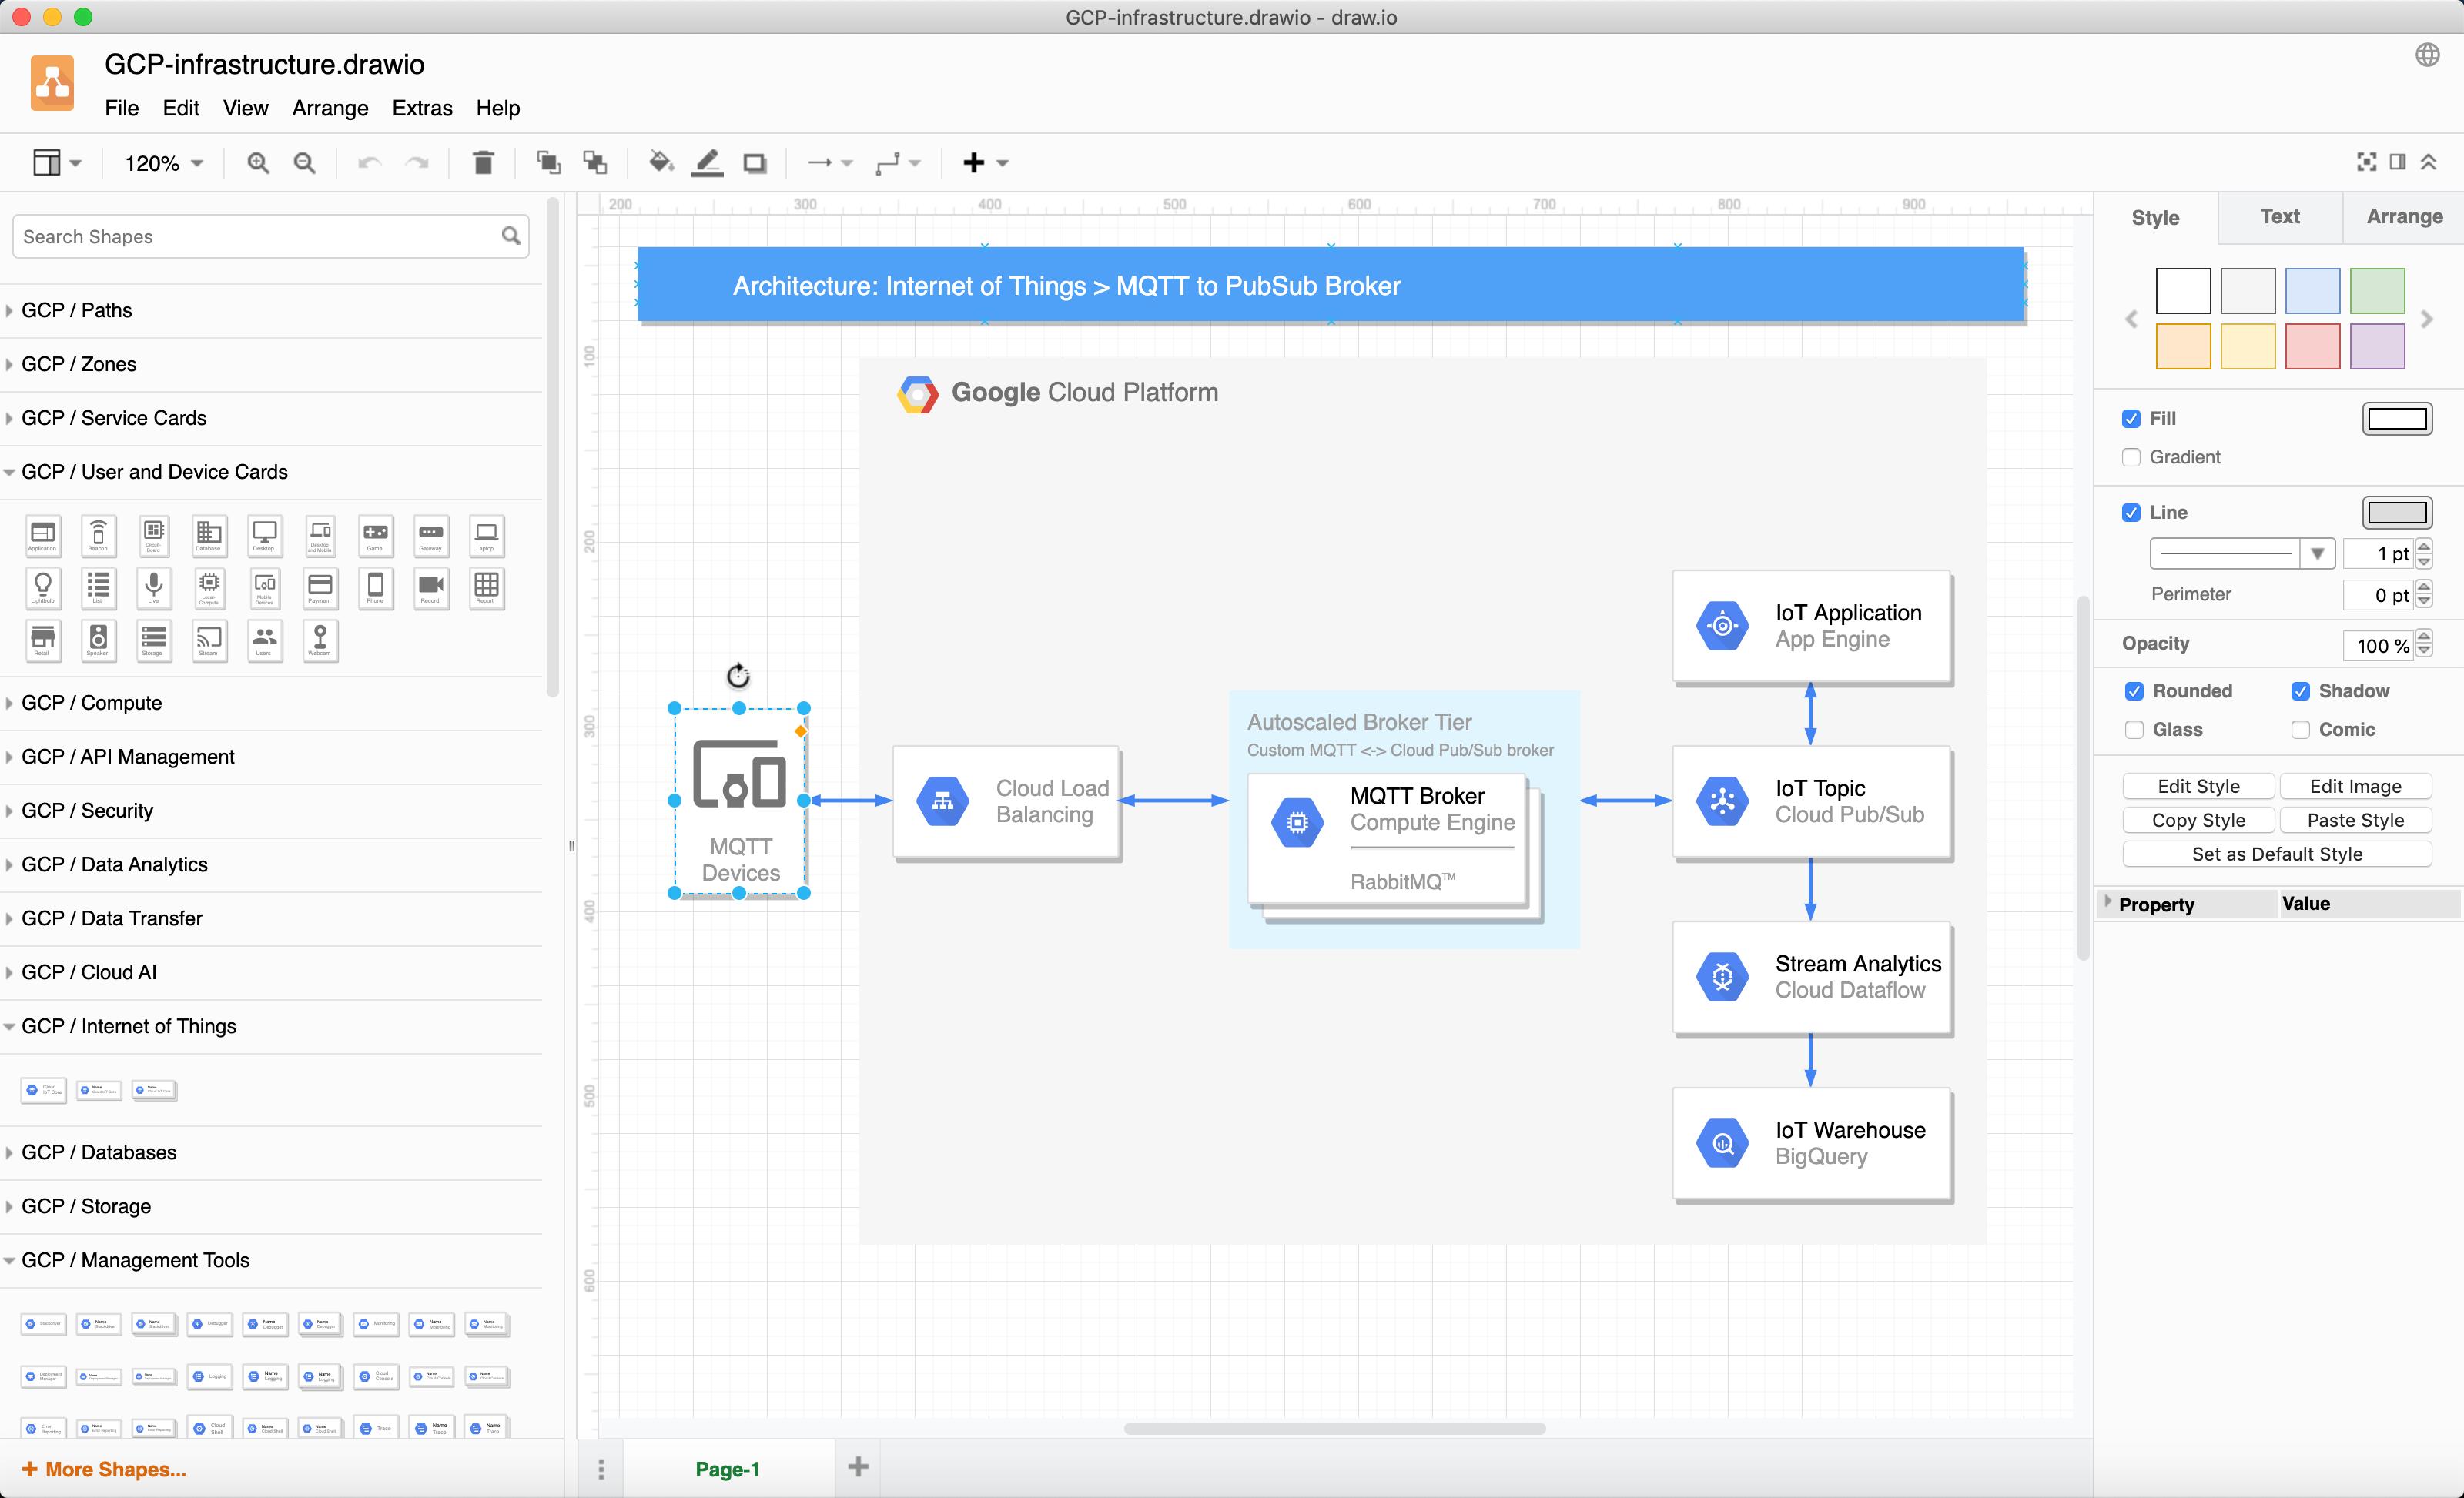 Run Diagrams Net Offline Draw Io Helpdesk